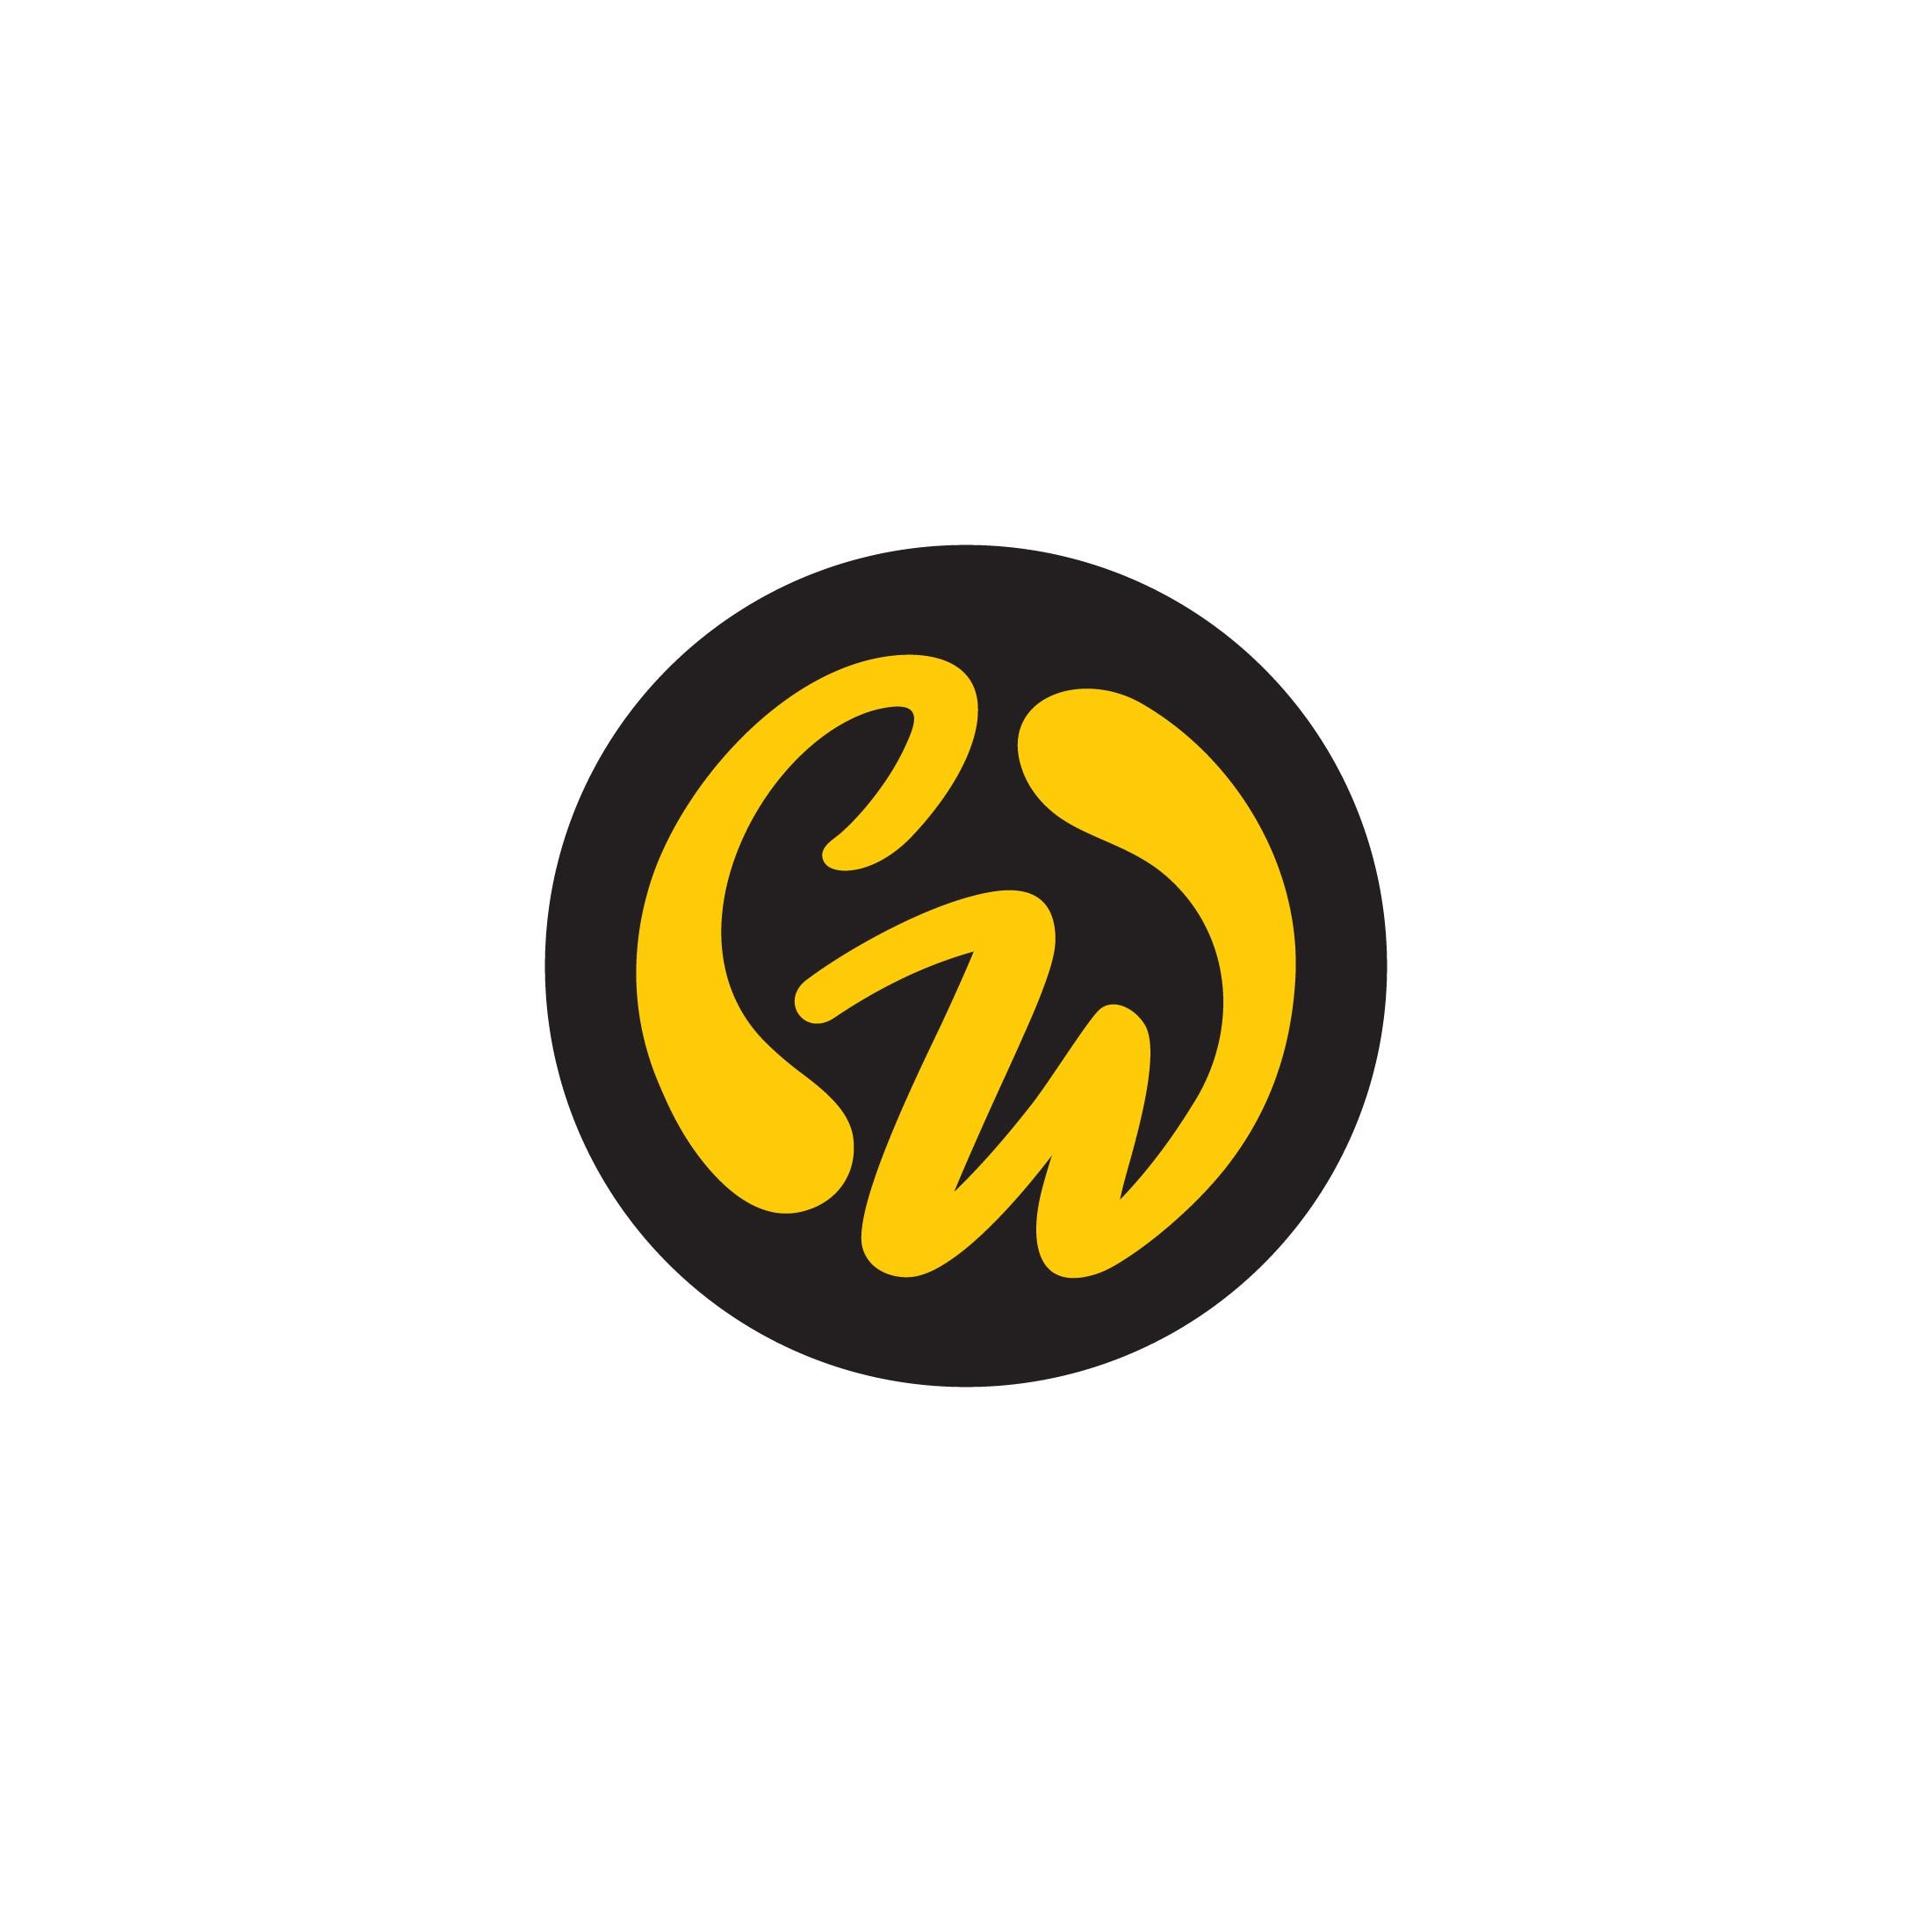 Custom Wraps needs a powerfull and professional logo